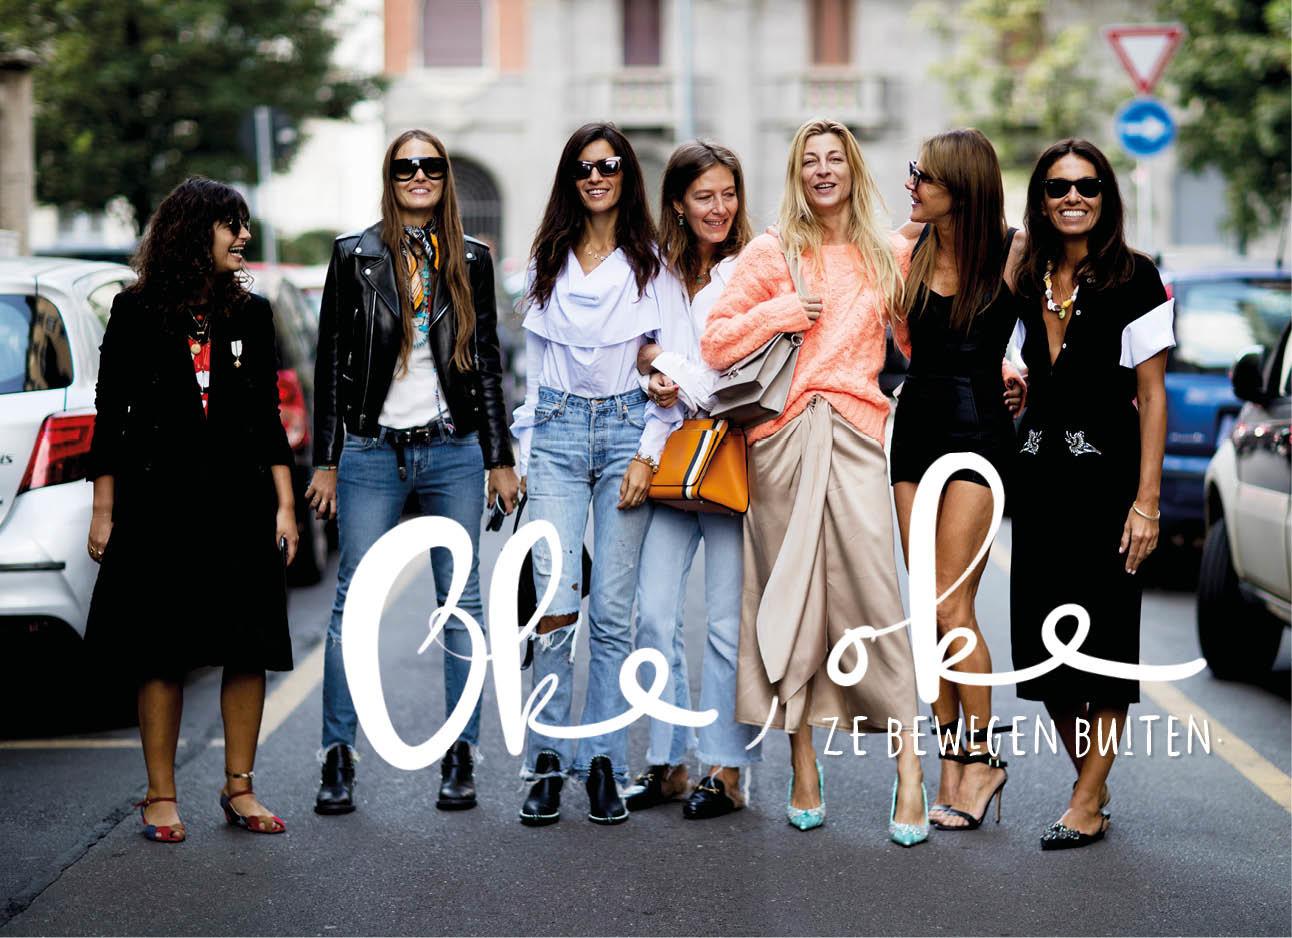 vrouwen wandelen op straat met een groep lachend jeans lange jurken gekleed streetwear